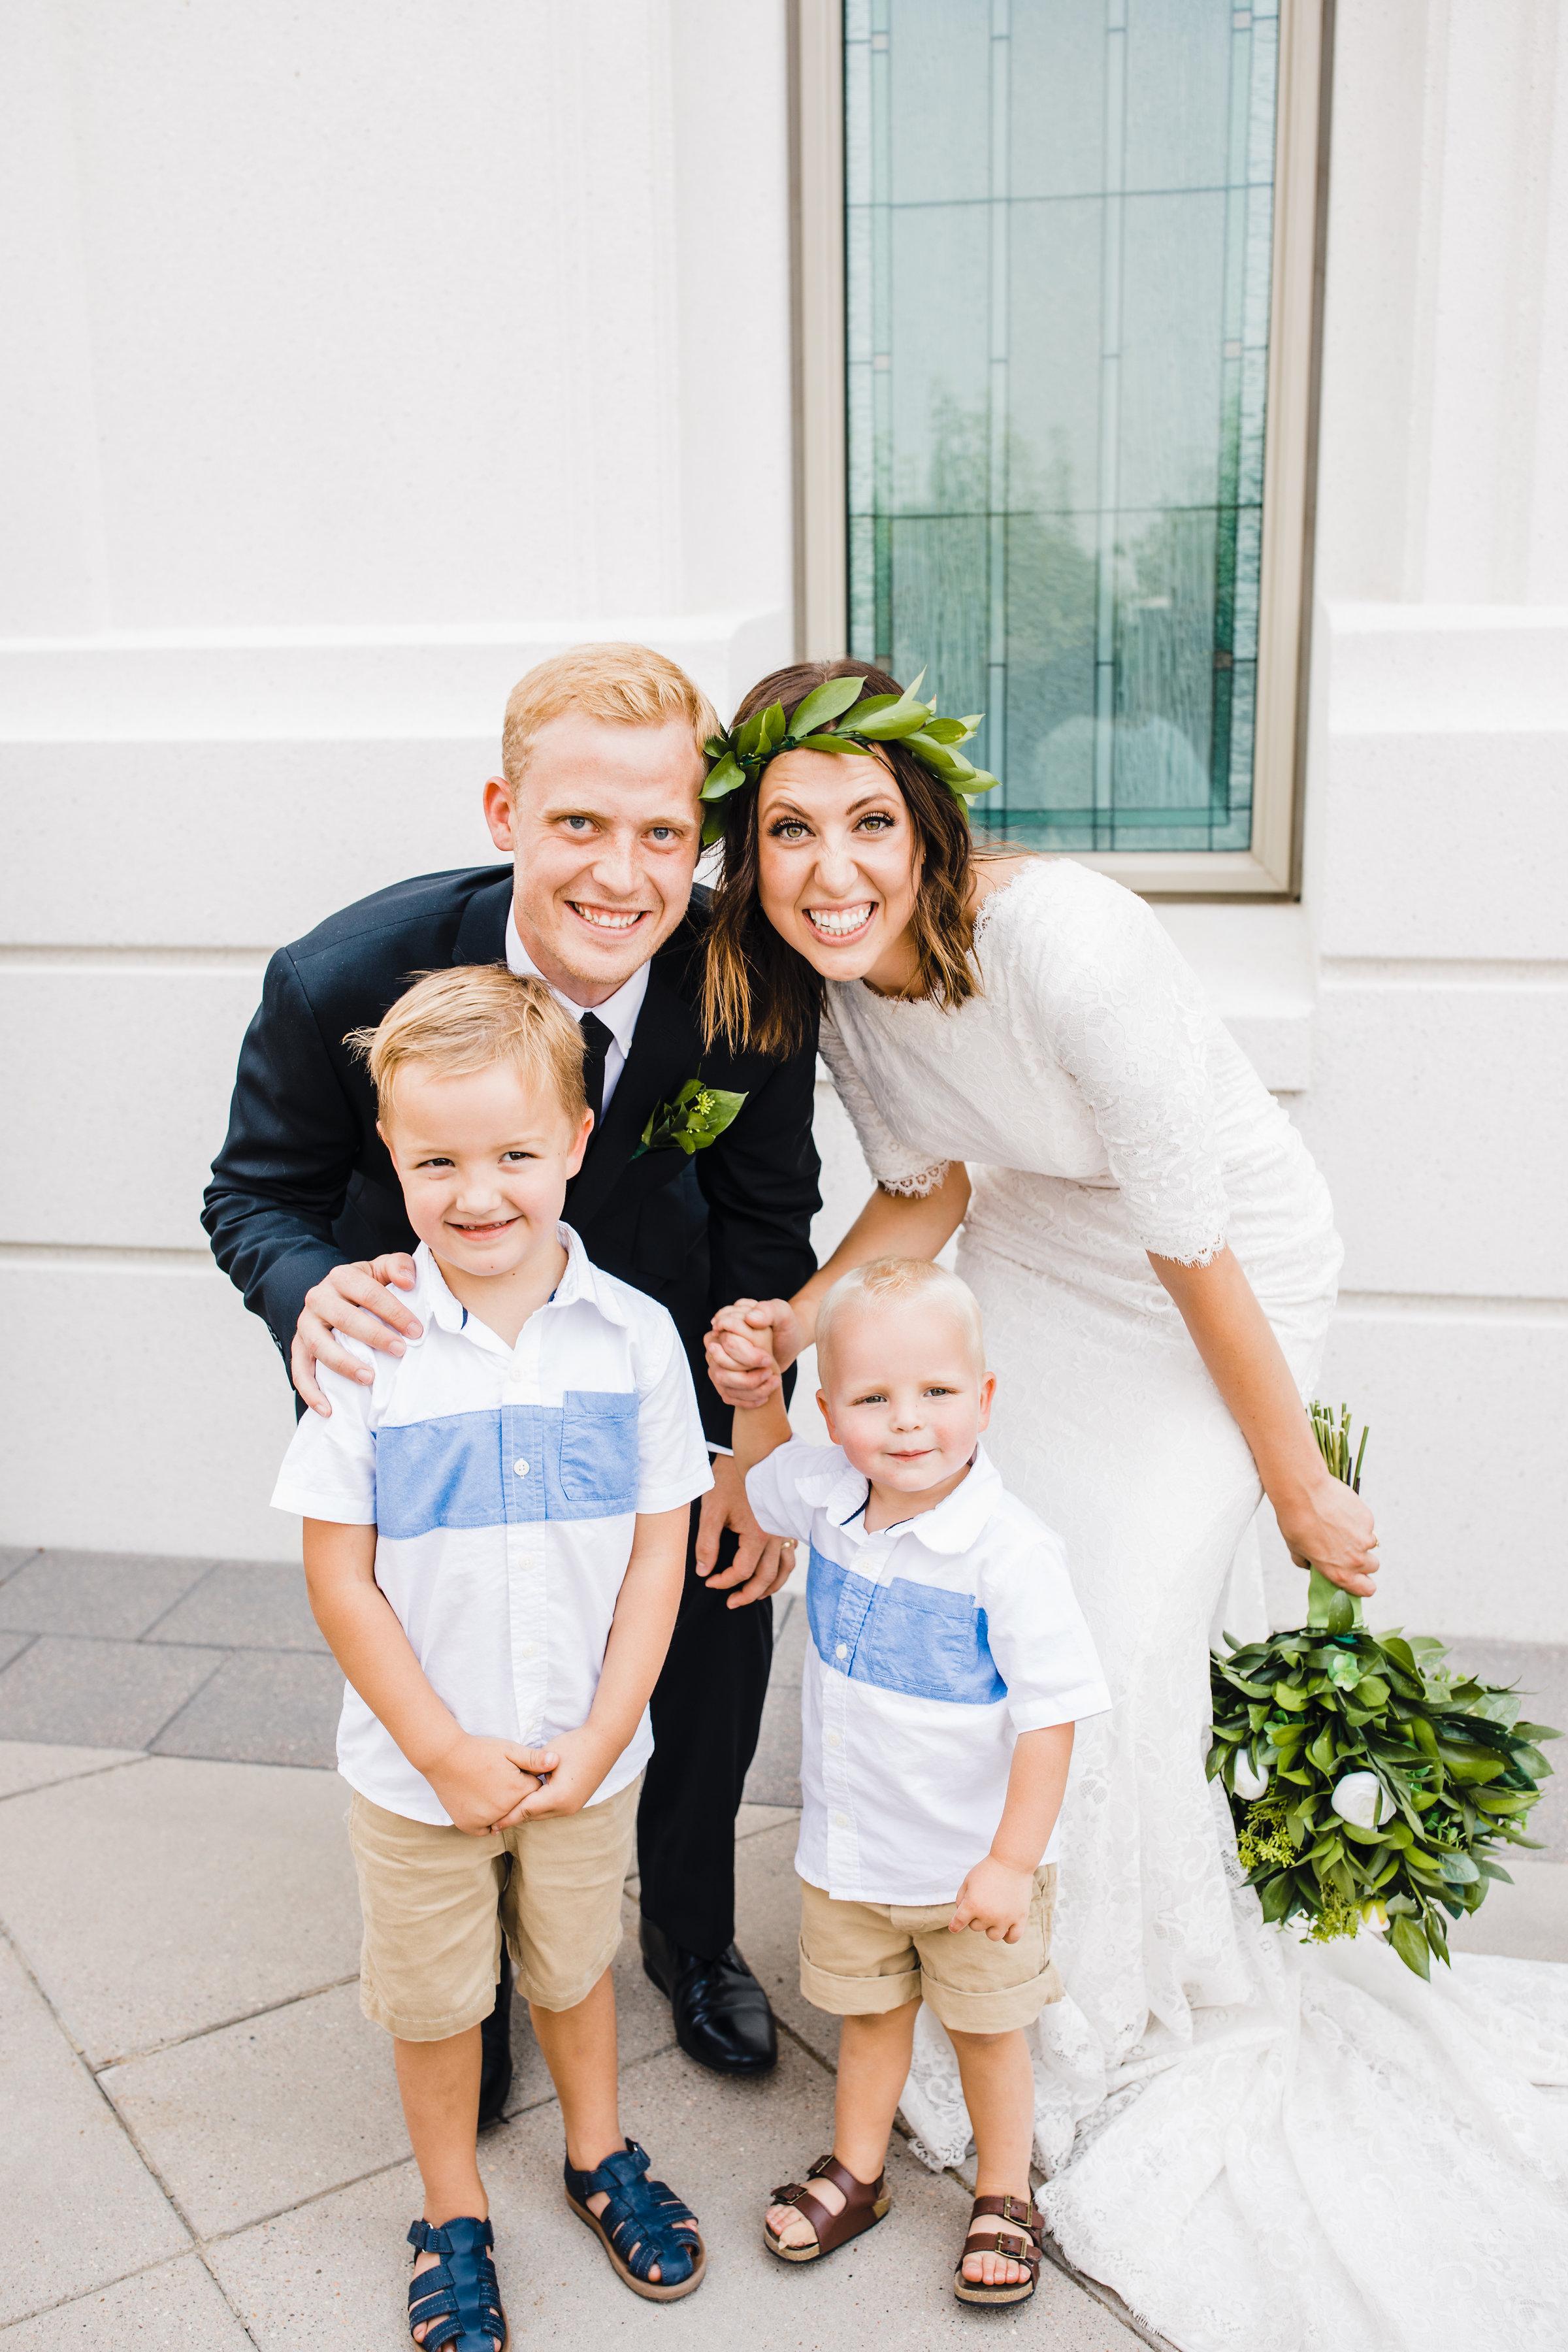 brigham city wedding photographer ring bearers